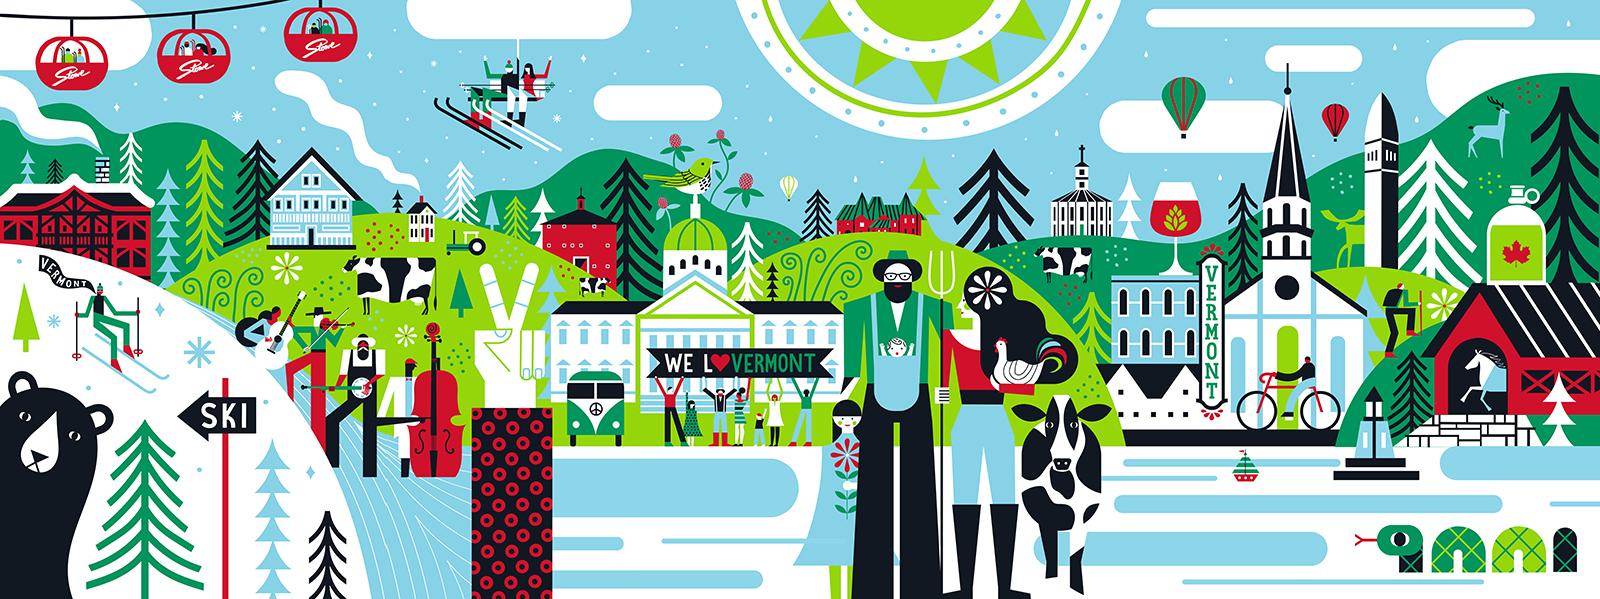 Target_Burlington_Mural.jpg